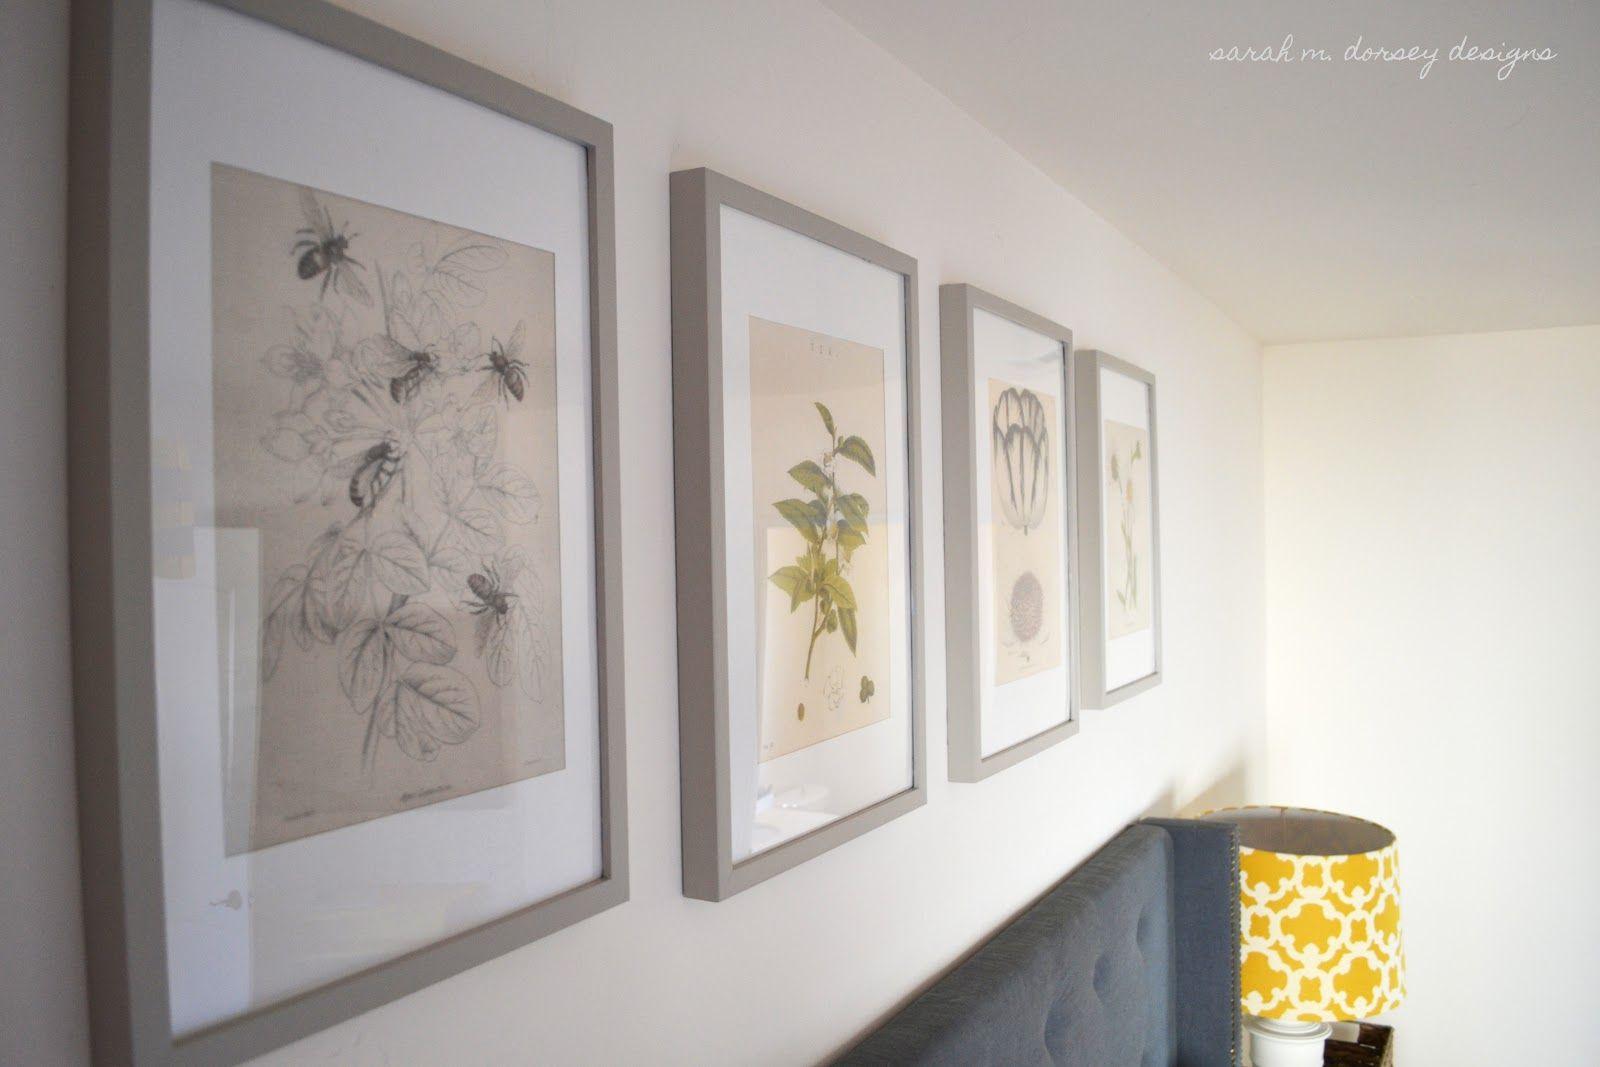 Sarah m dorsey designs home pinterest master bedroom and bedrooms